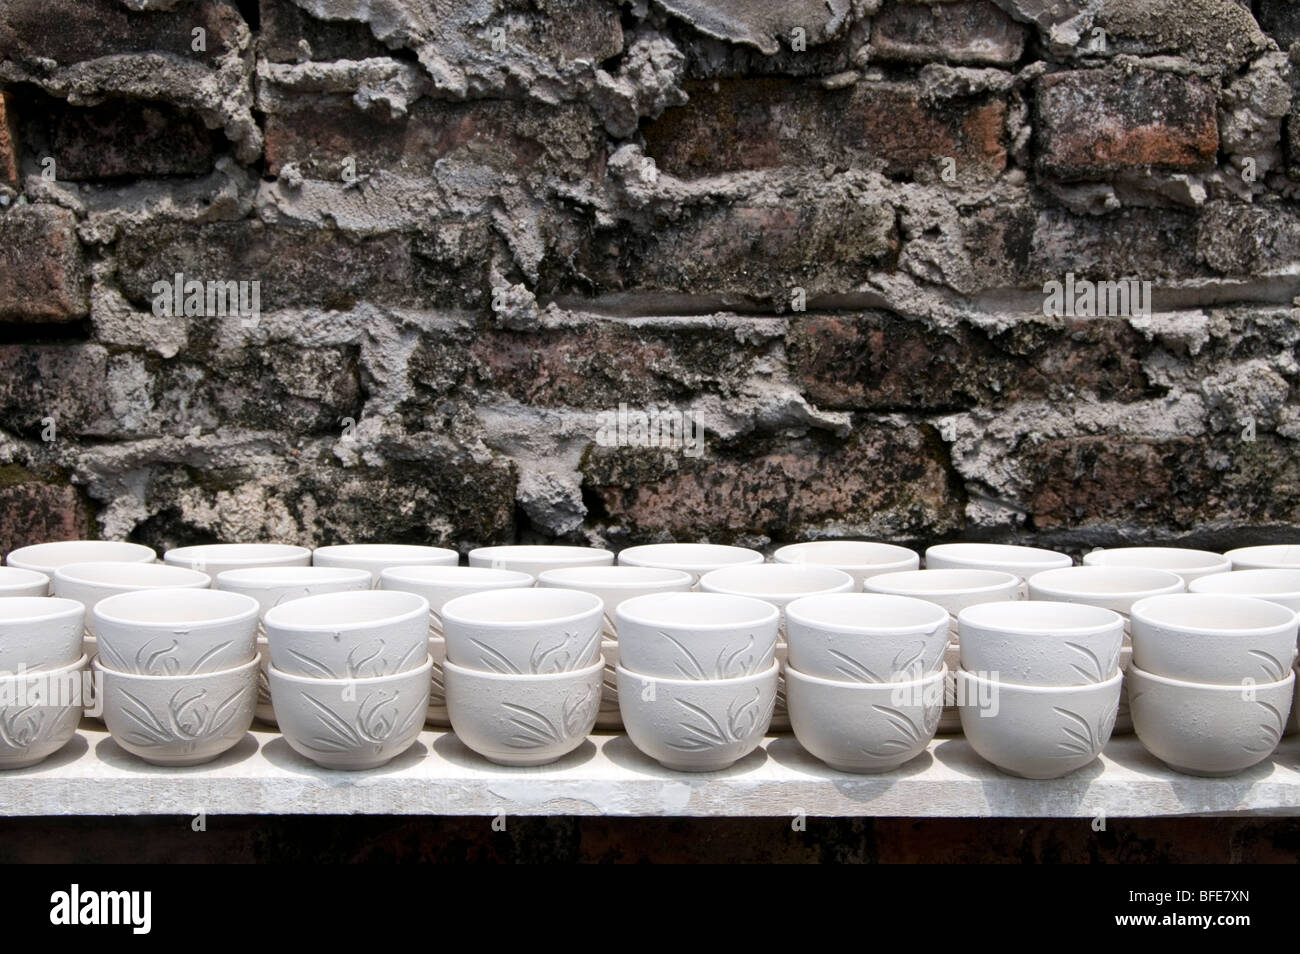 Cups drying in the sun at Bat Trang Commune, Gia Lam District, Hanoi, Vietnam - Stock Image